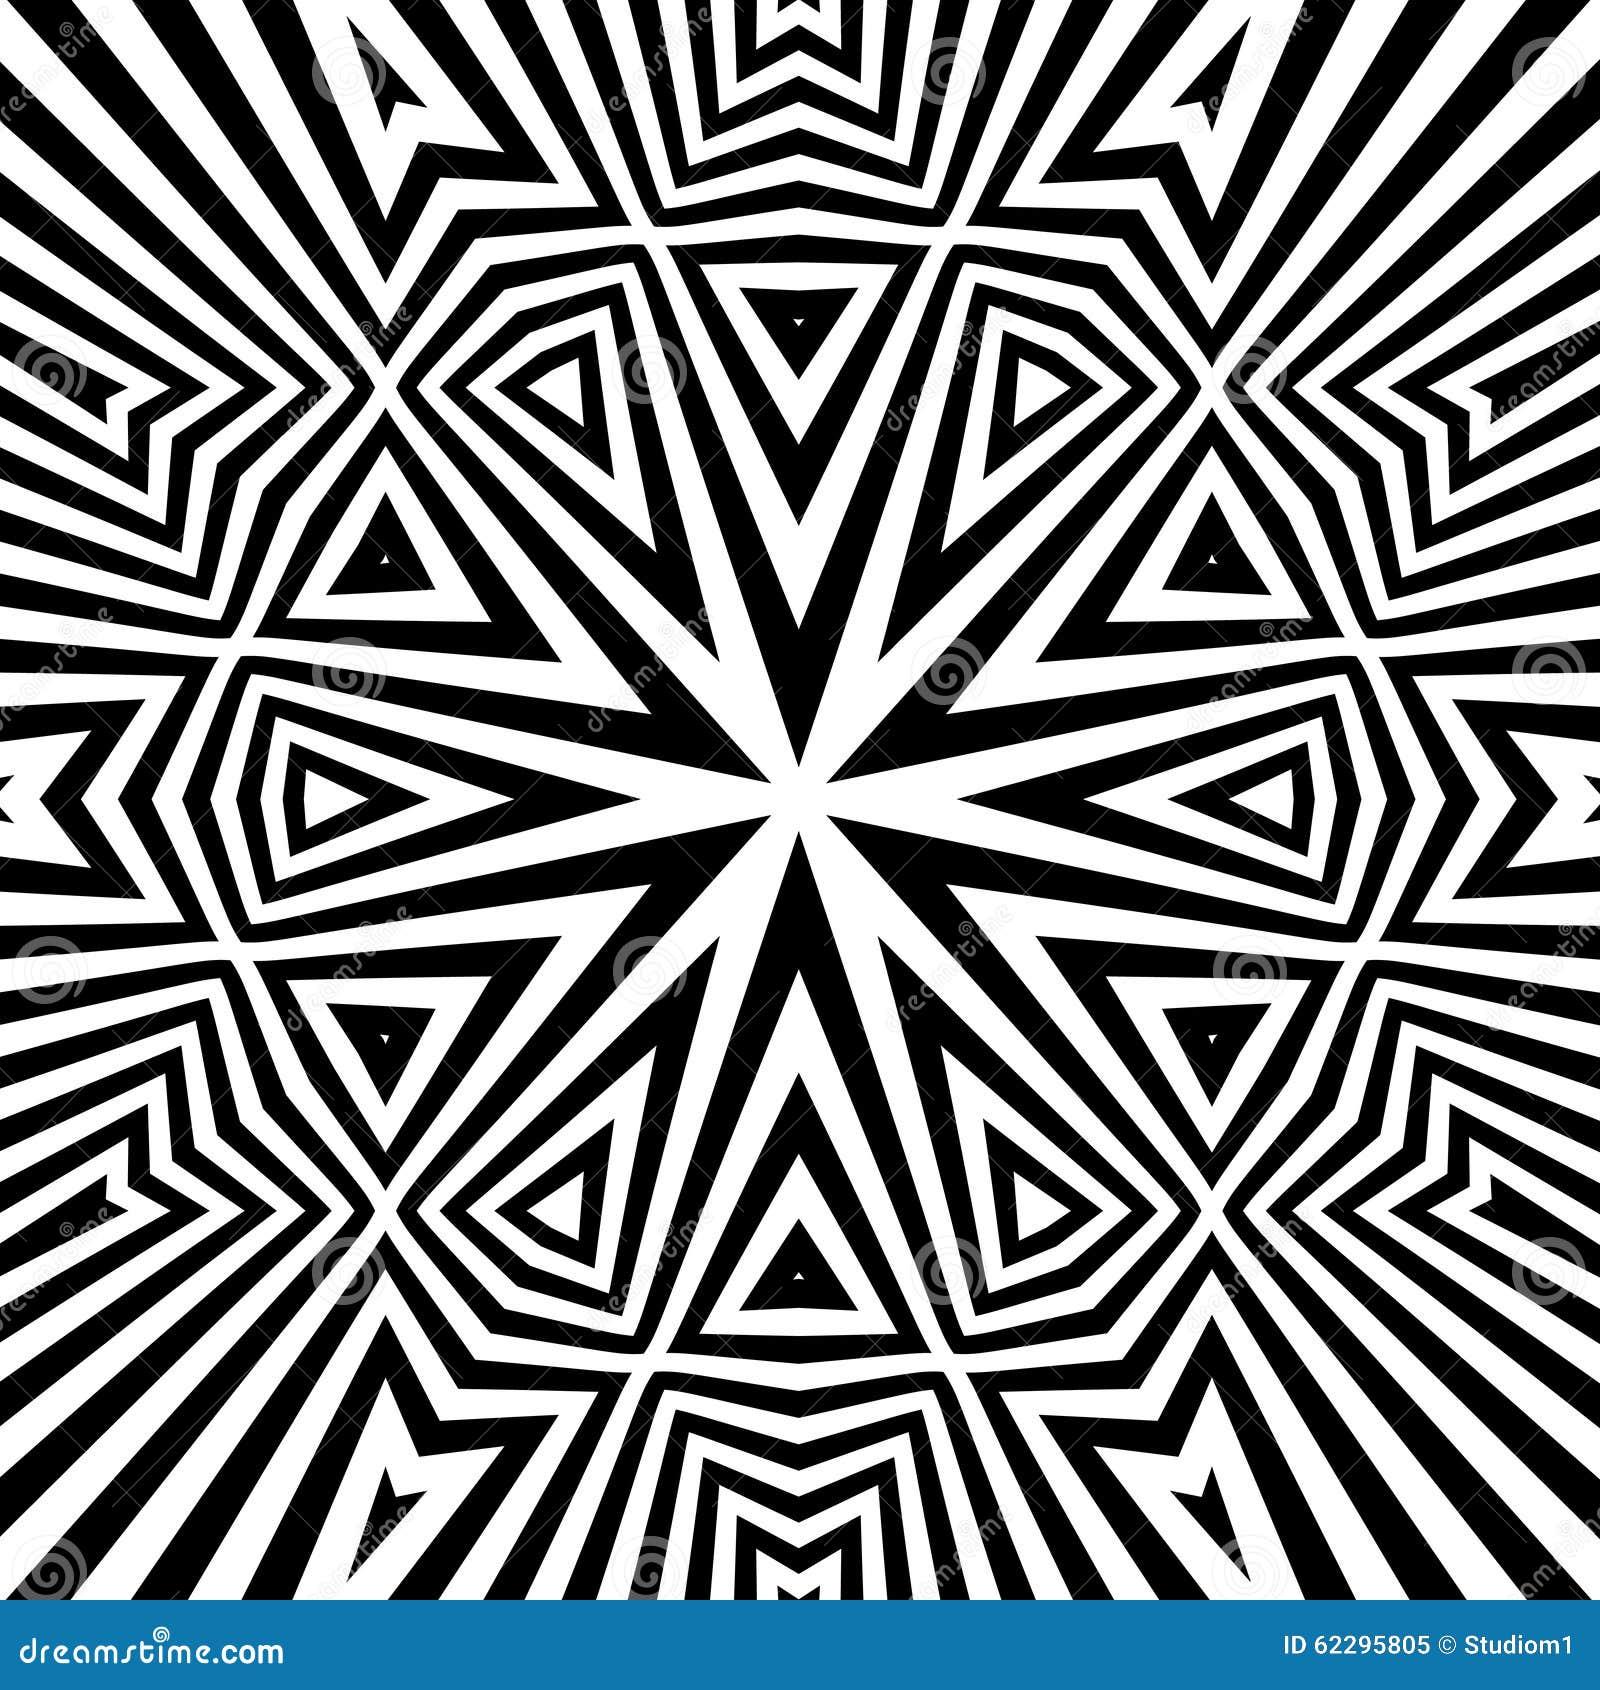 Black And White Zebra Print Background Clip Art at Clker.com - vector clip  art online, royalty free & public domain